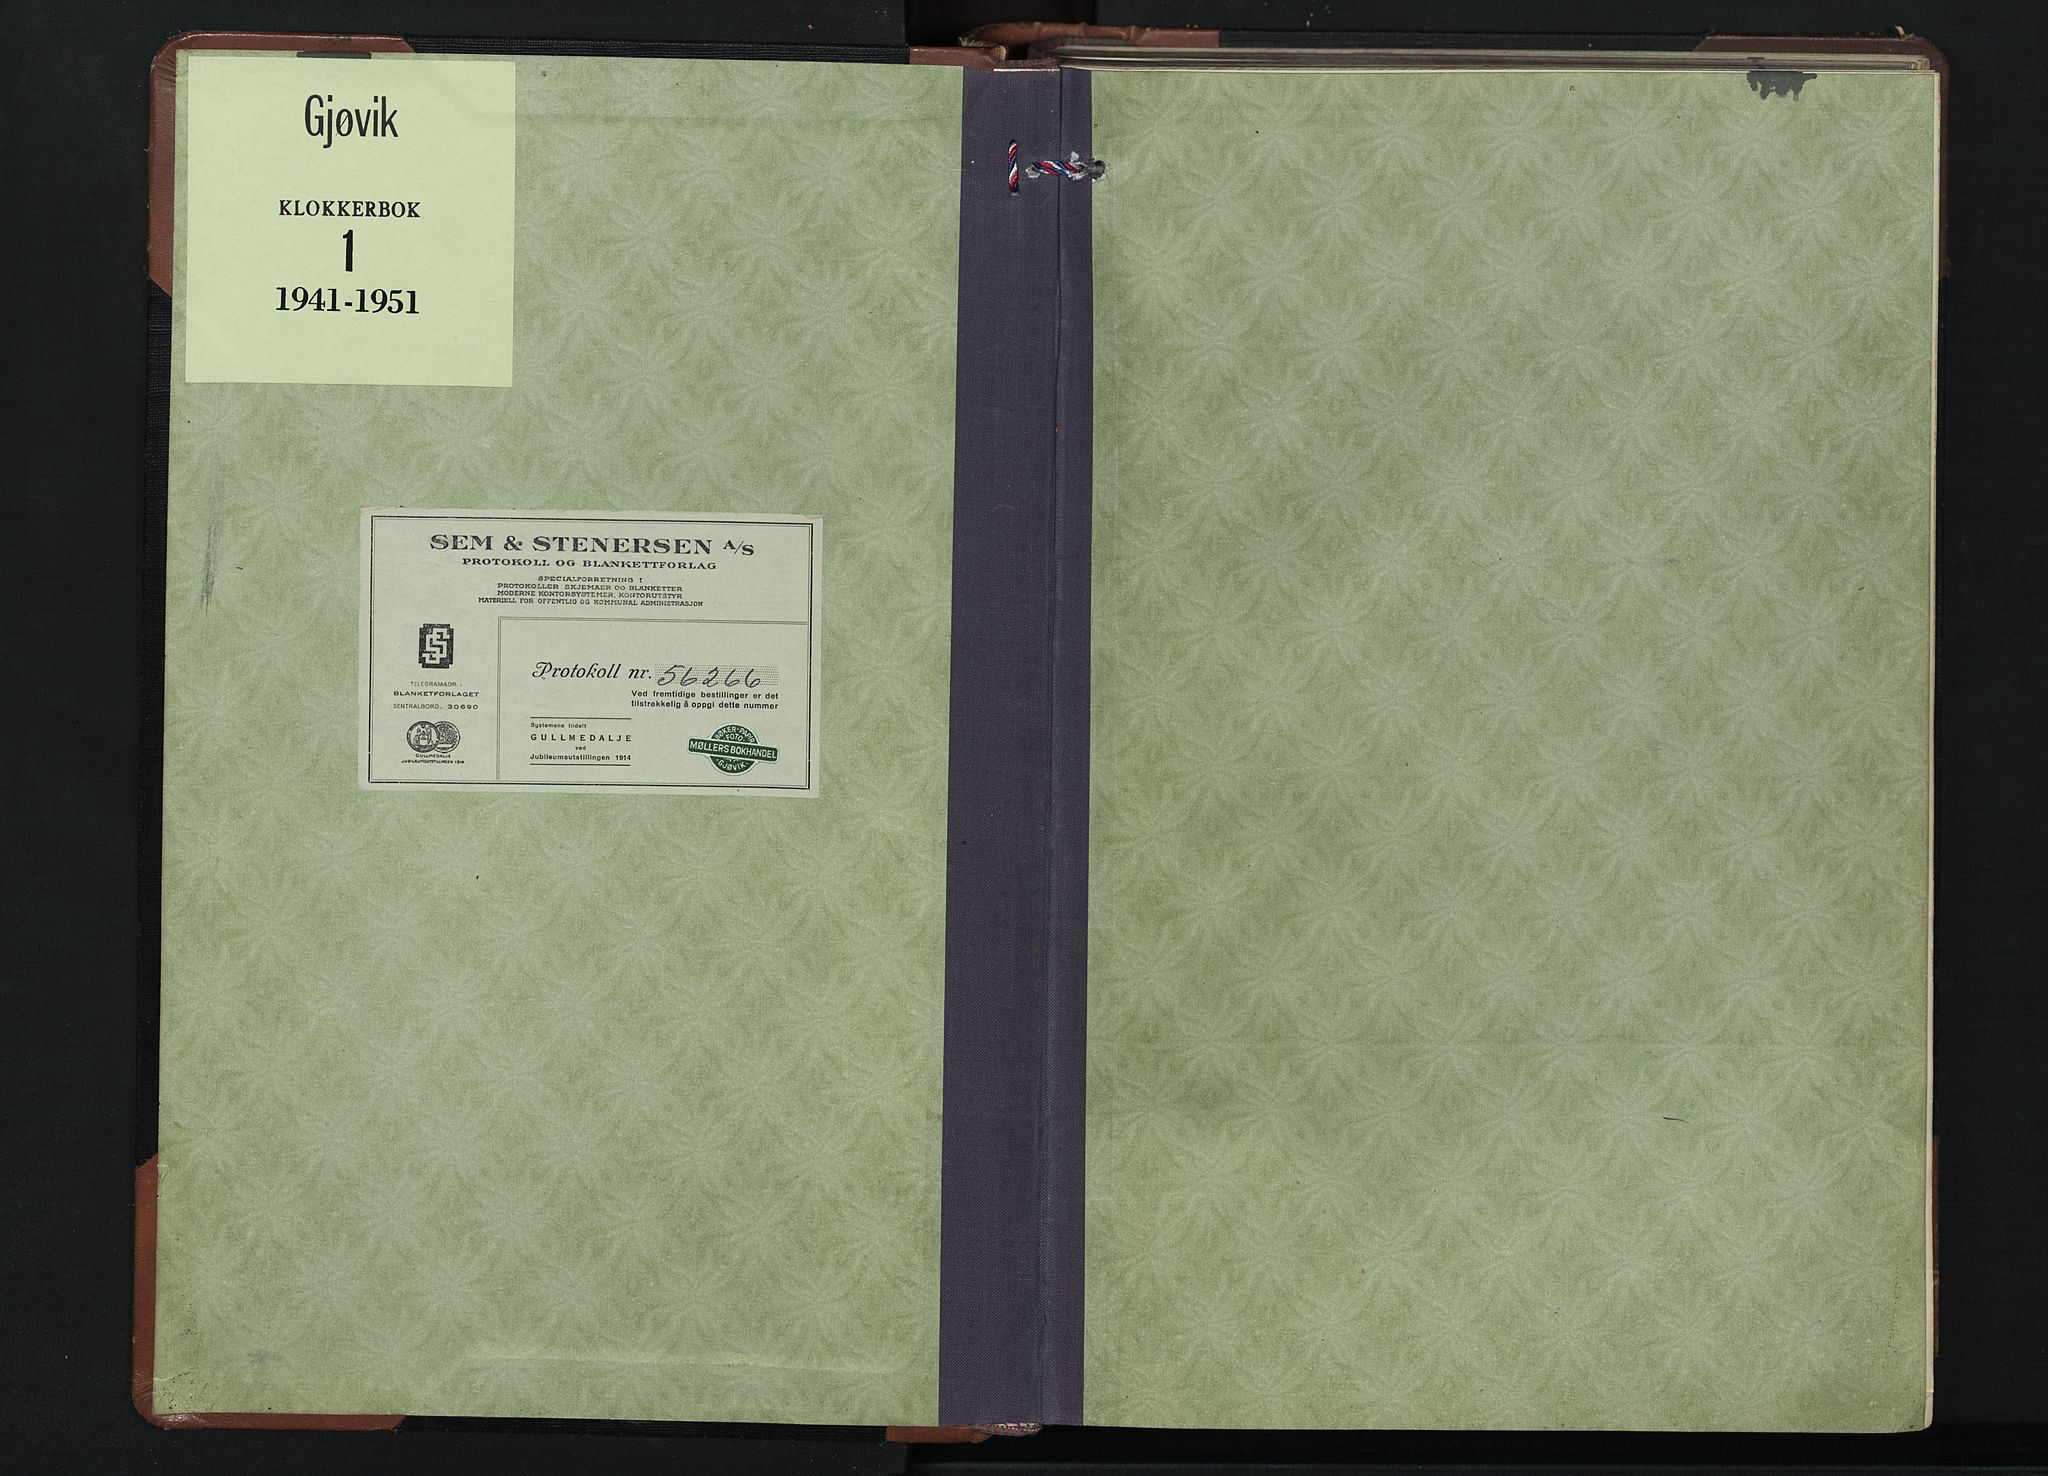 SAH, Gjøvik prestekontor, Klokkerbok nr. 1, 1941-1951